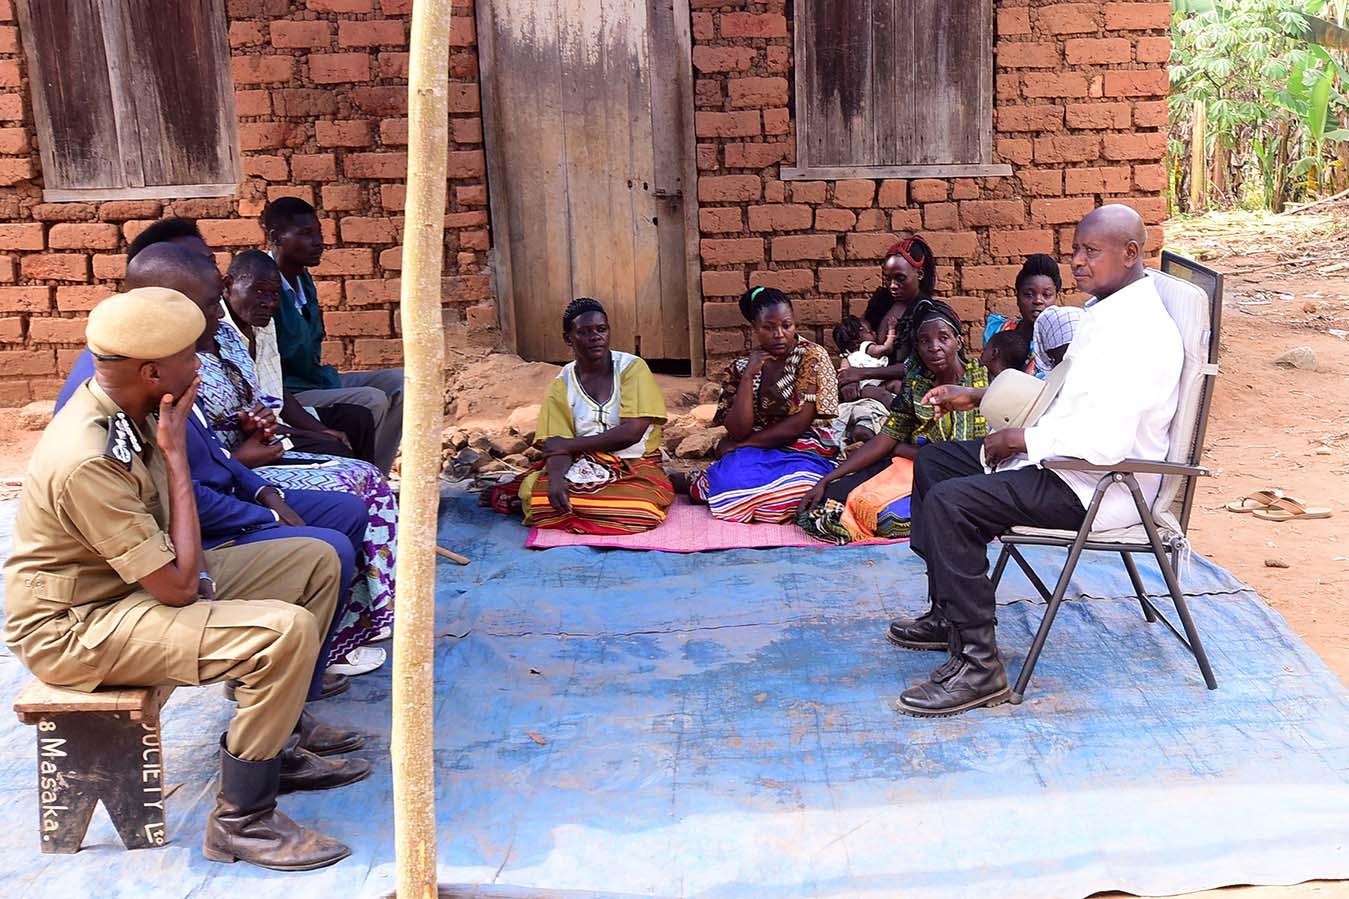 Bukomansimbi - Lwengo murder victims - President Museveni visits families